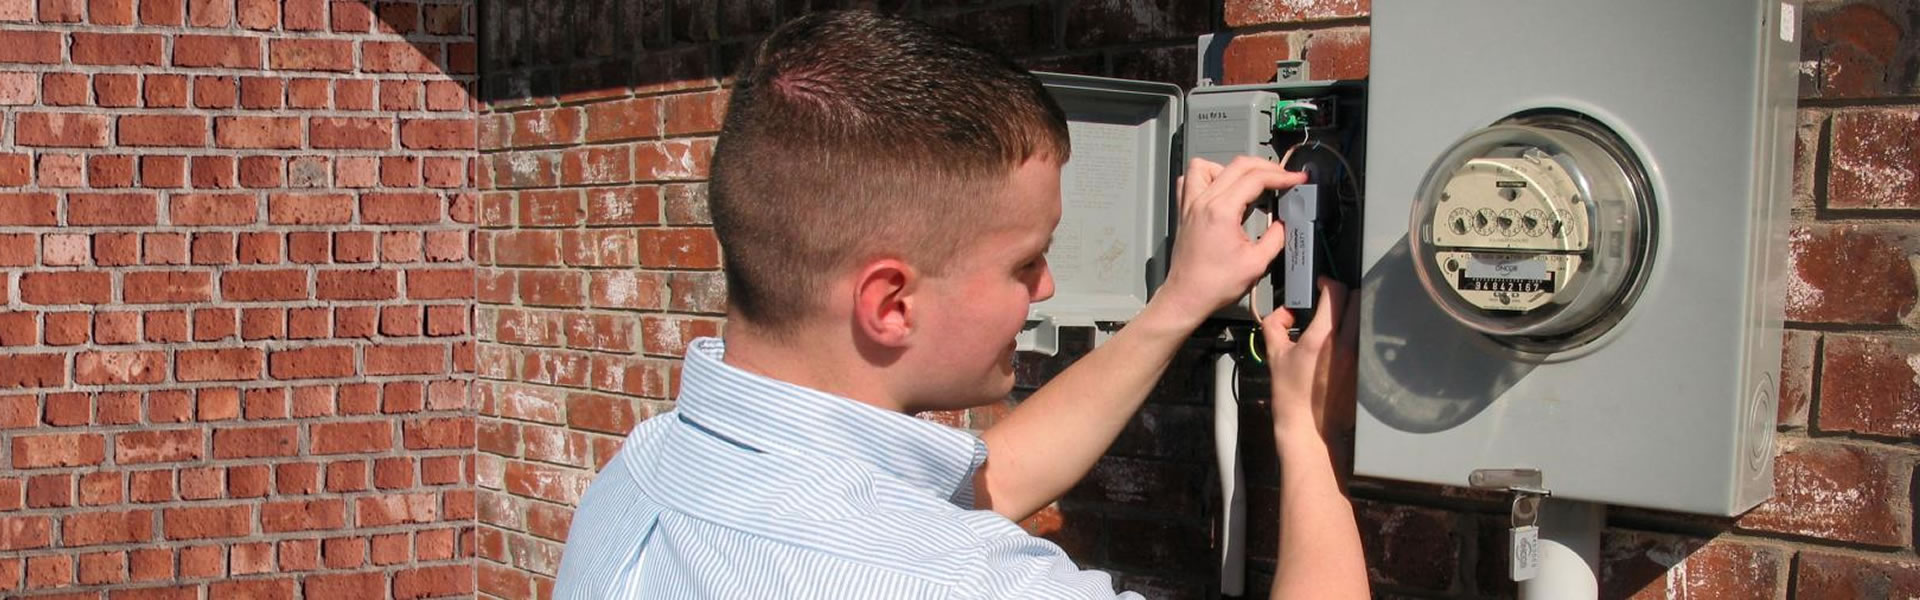 Electrical Wiring Installation Fort Worth, TX | Wiring Upgrades ...